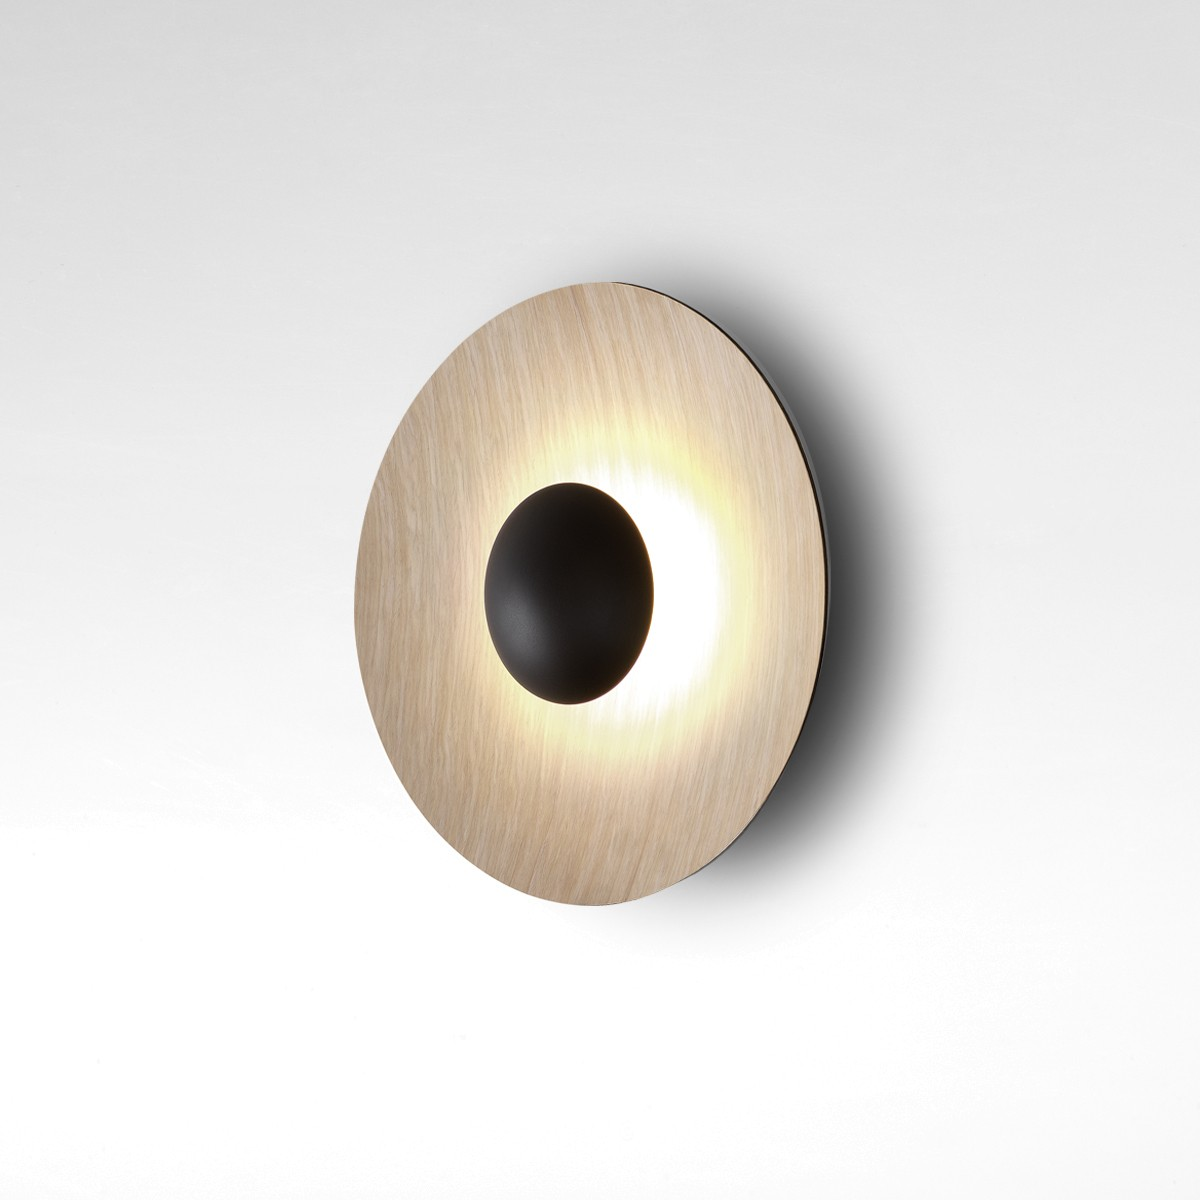 Marset Ginger 32 C LED Wandleuchte, Eiche